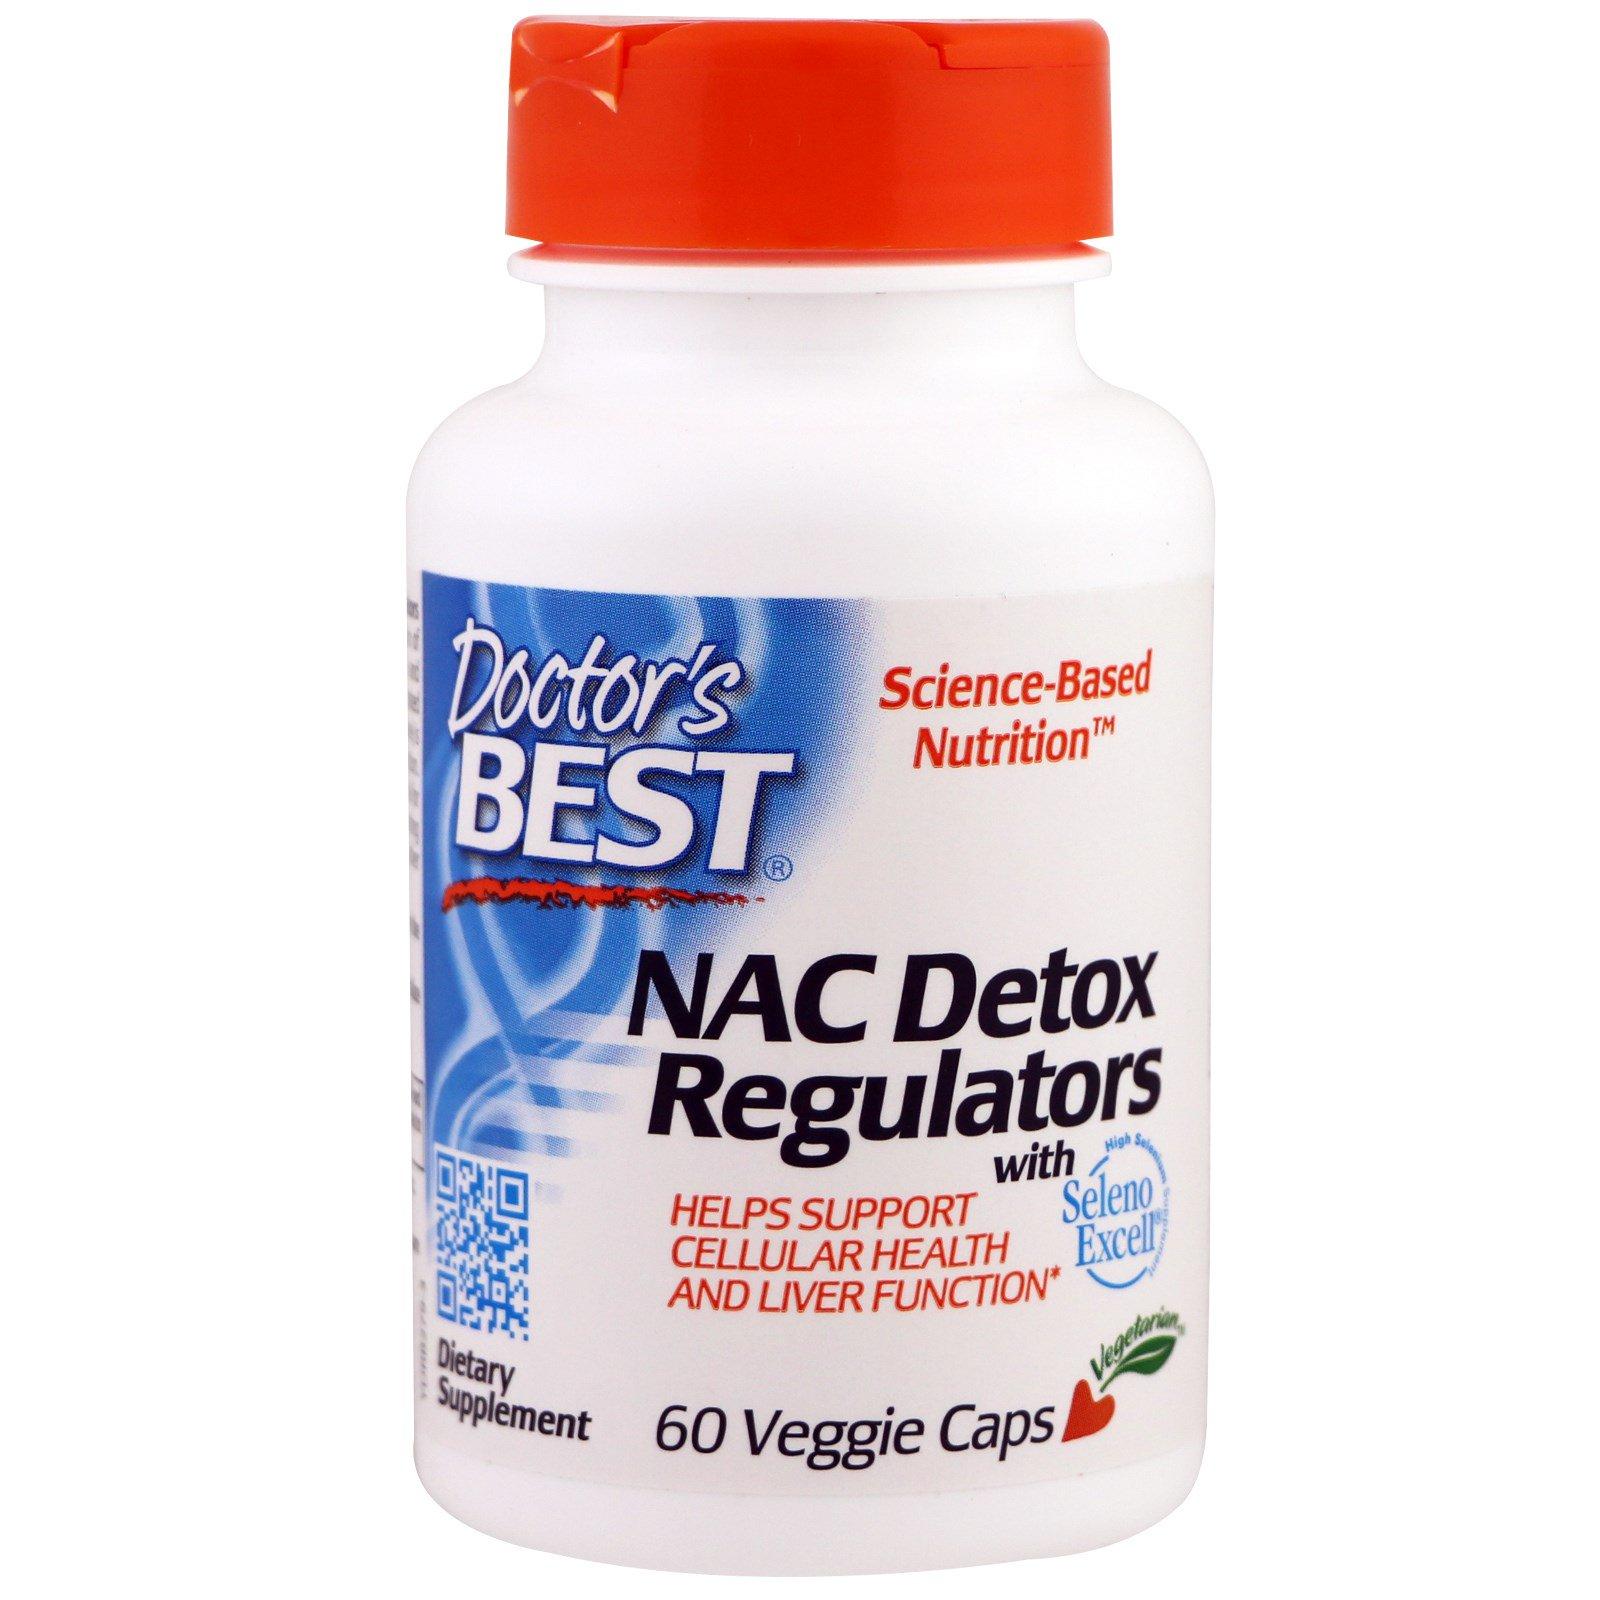 Doctor's Best, NAC регуляторы детоксикации, 60 растительных капсул